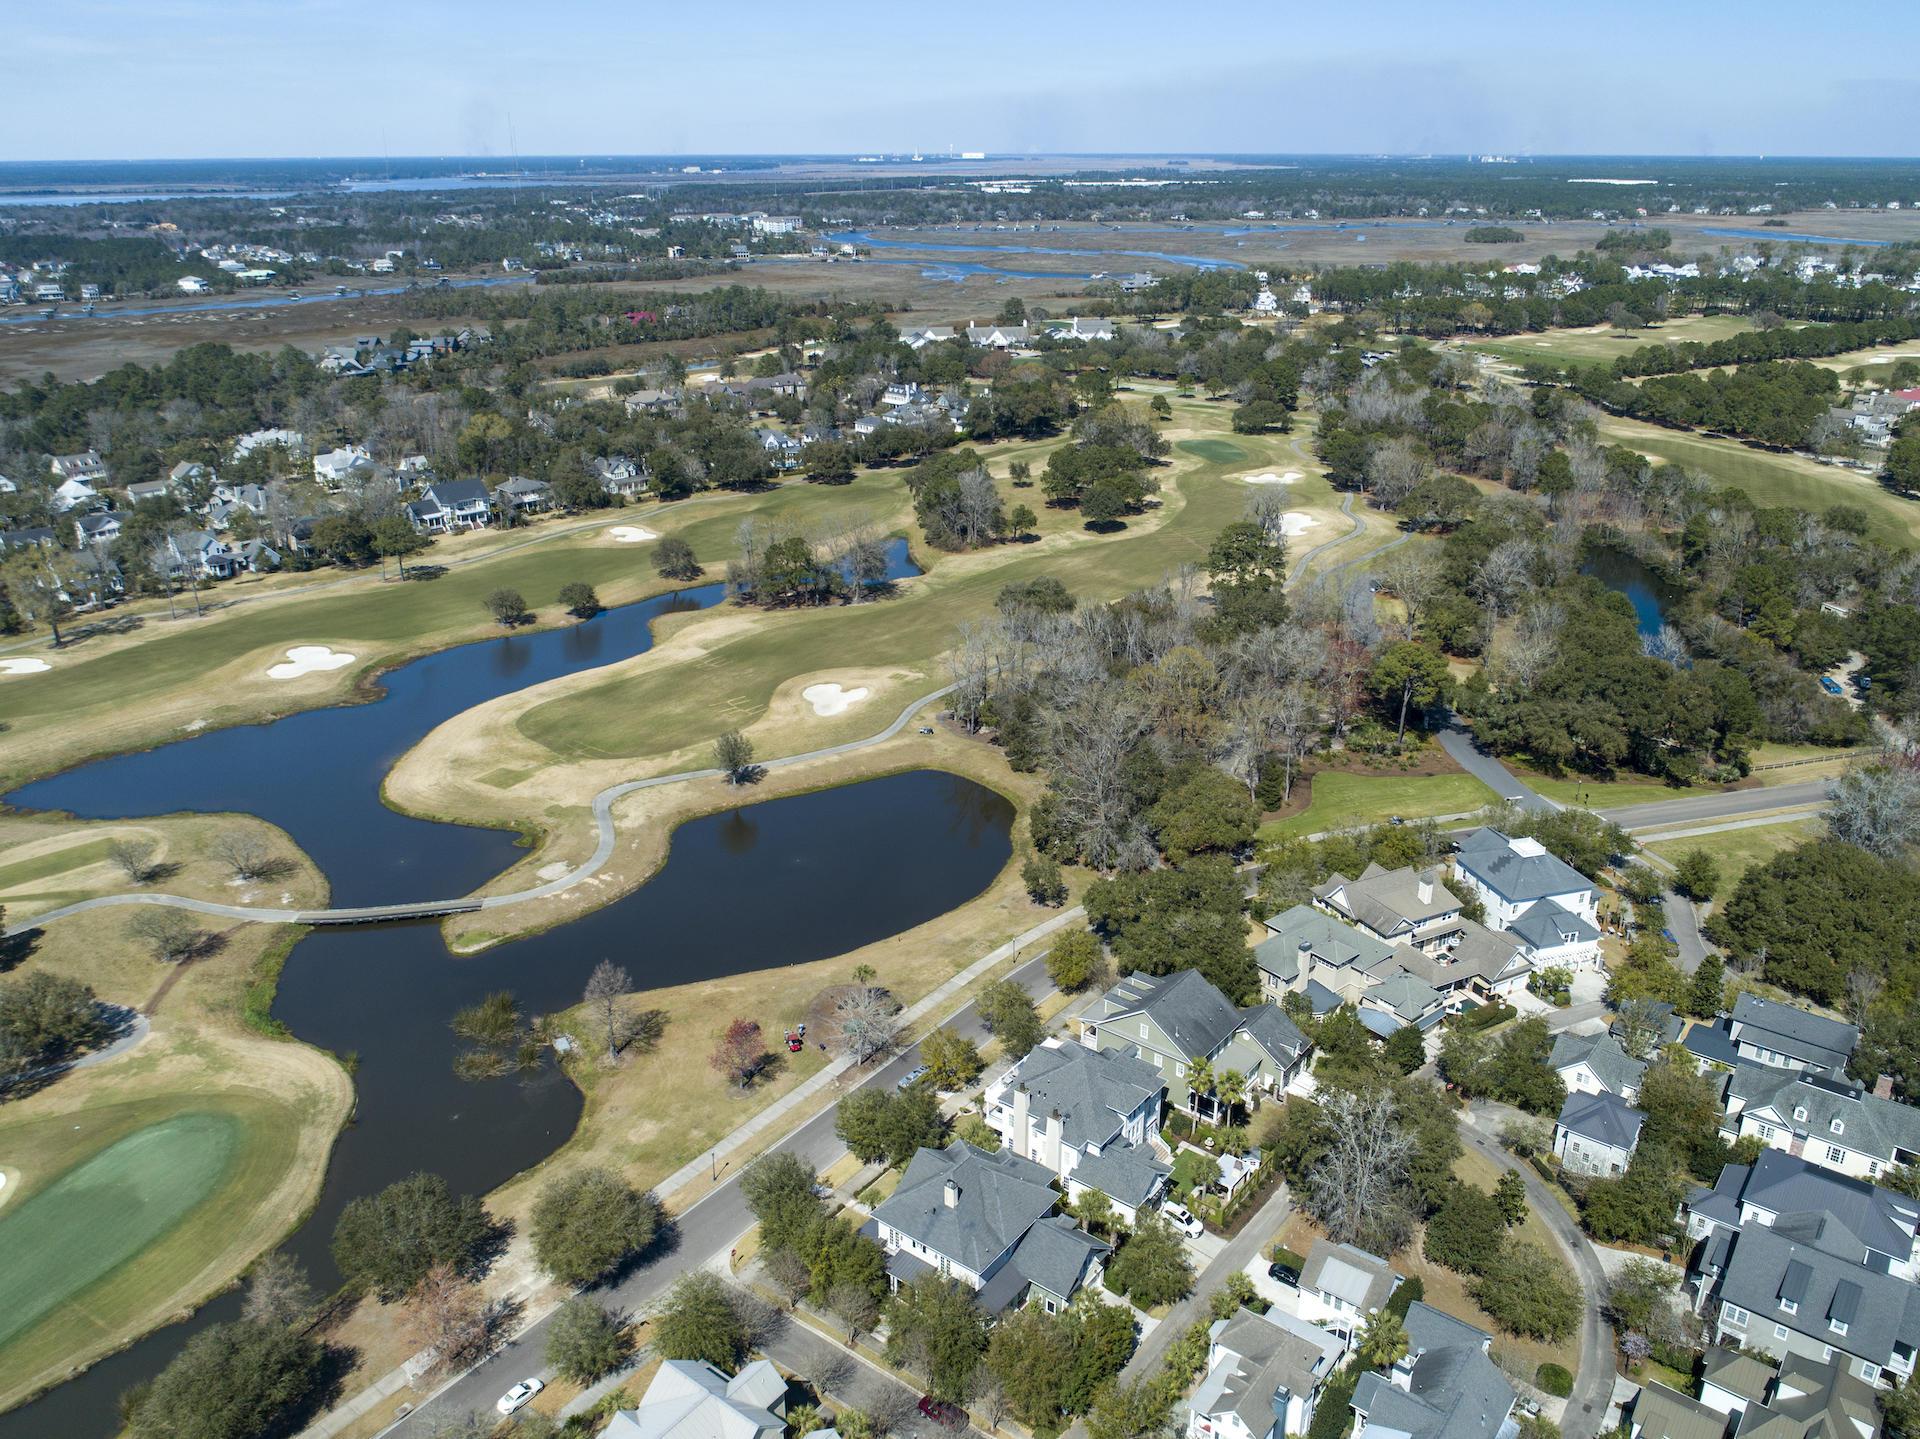 Daniel Island Homes For Sale - 623 Island Park, Charleston, SC - 3